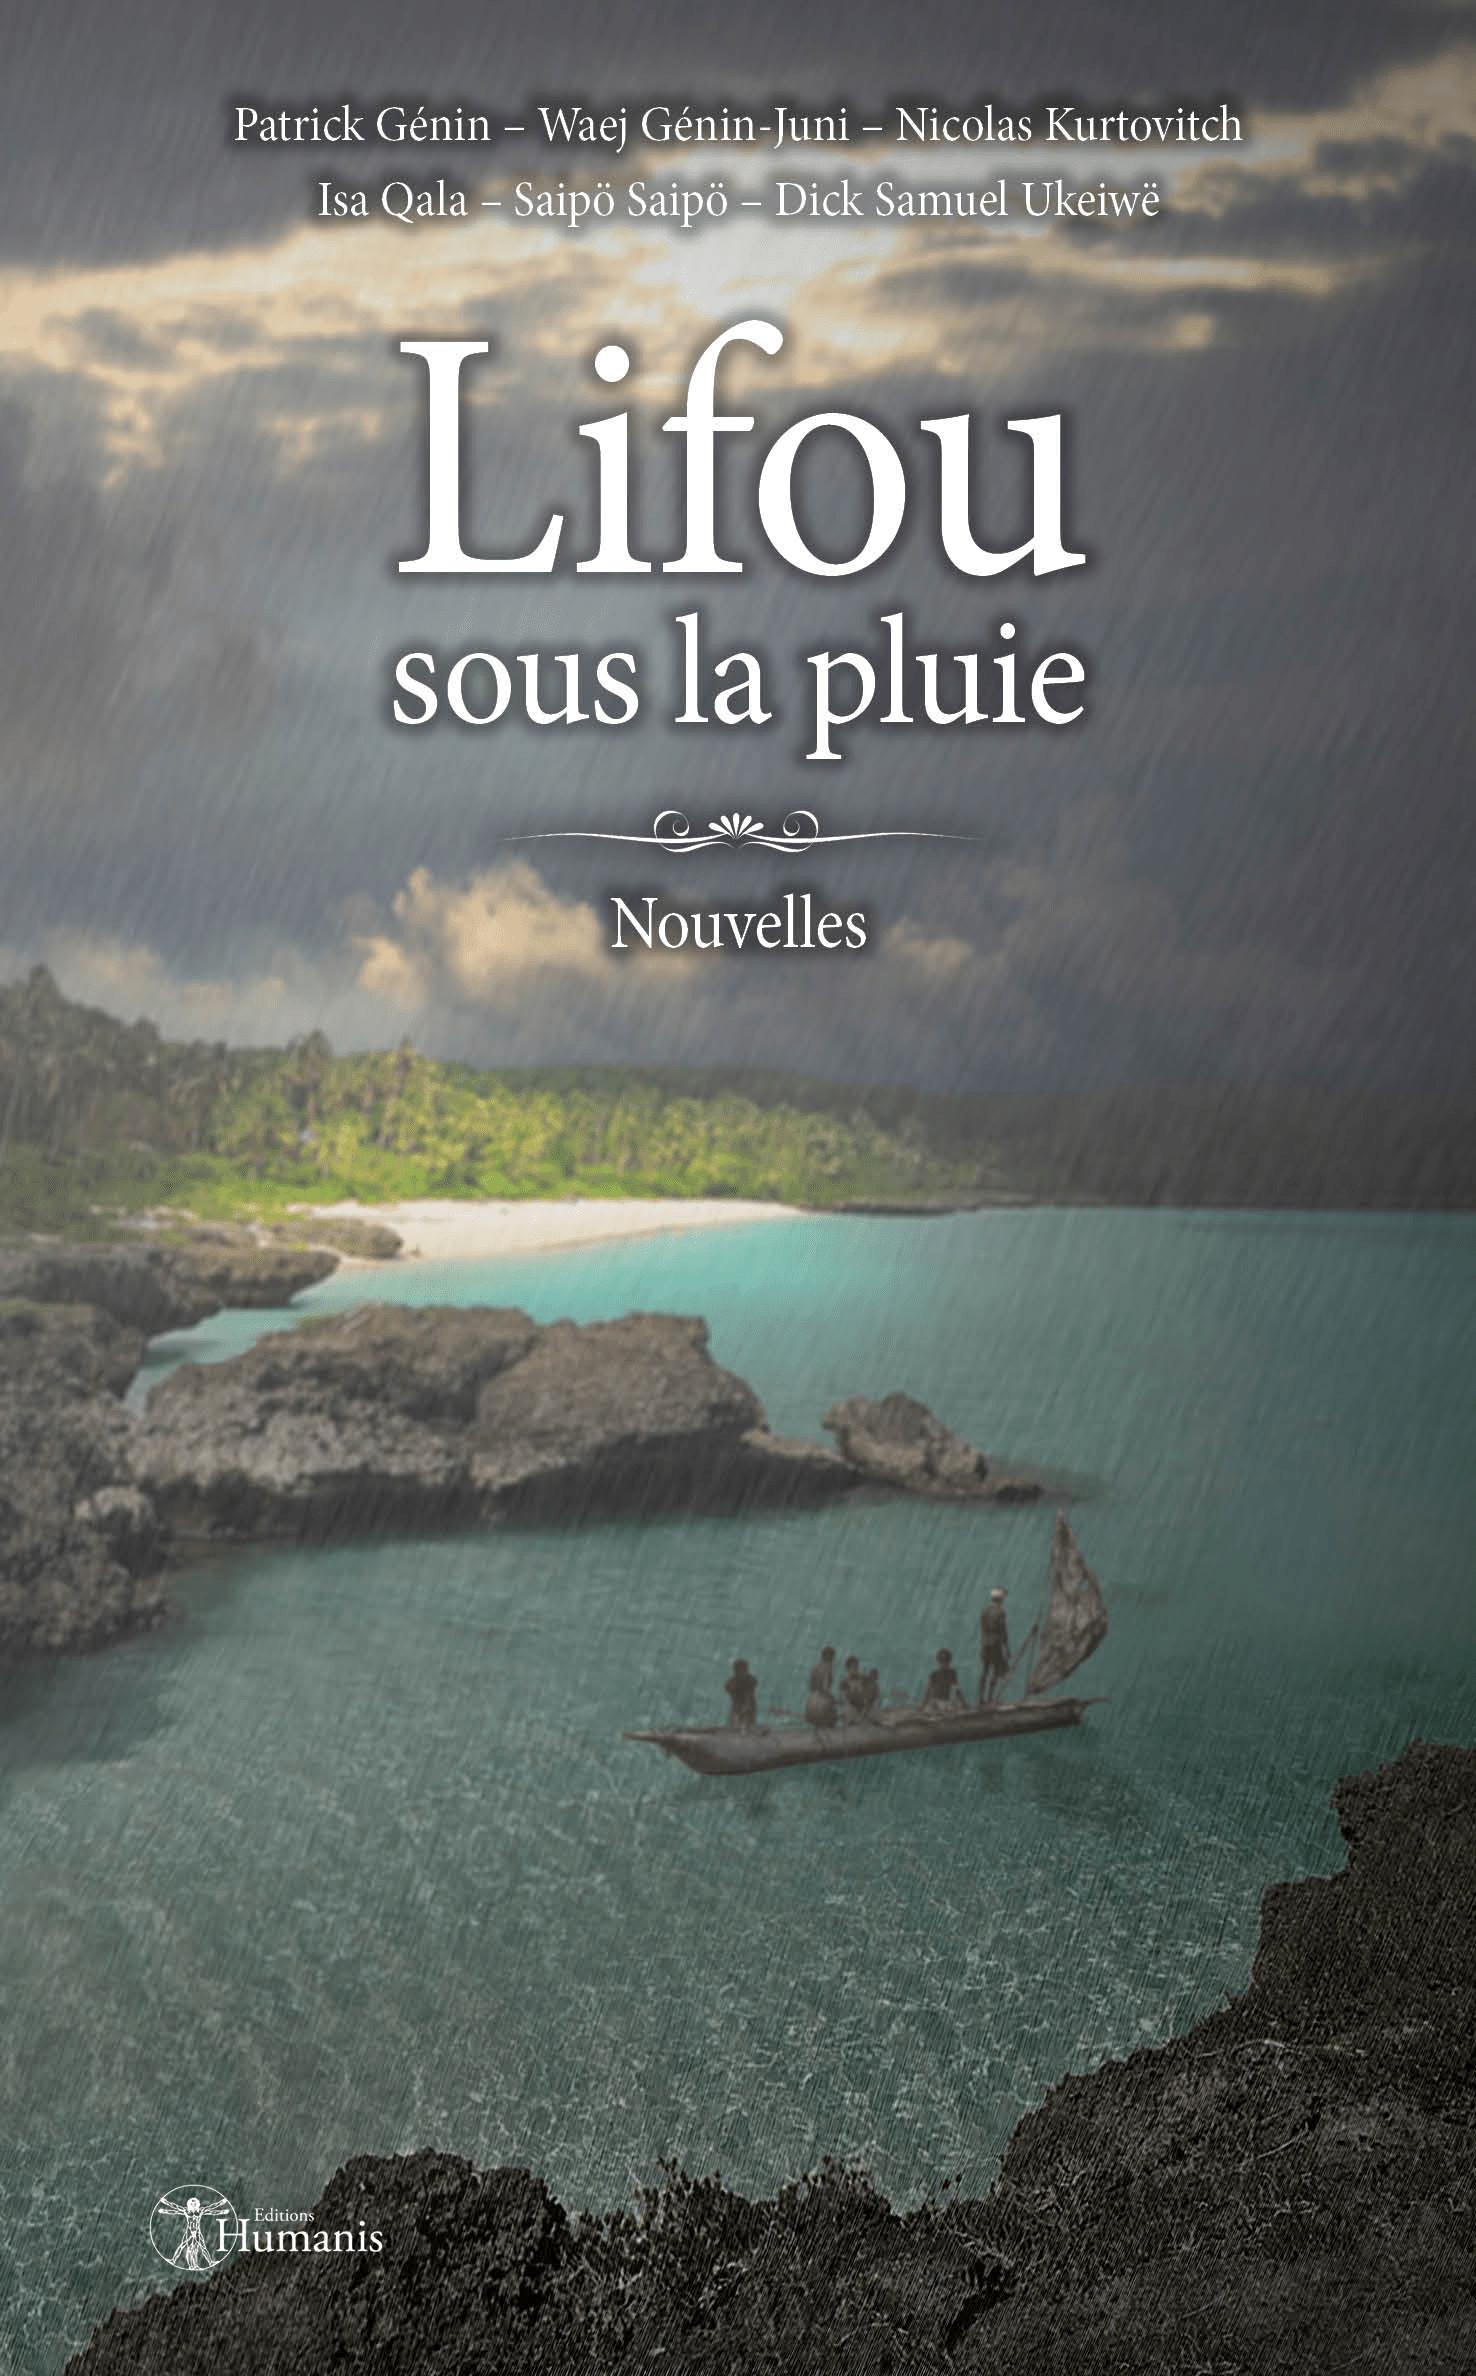 Isa qala lifou-sous-la-pluie